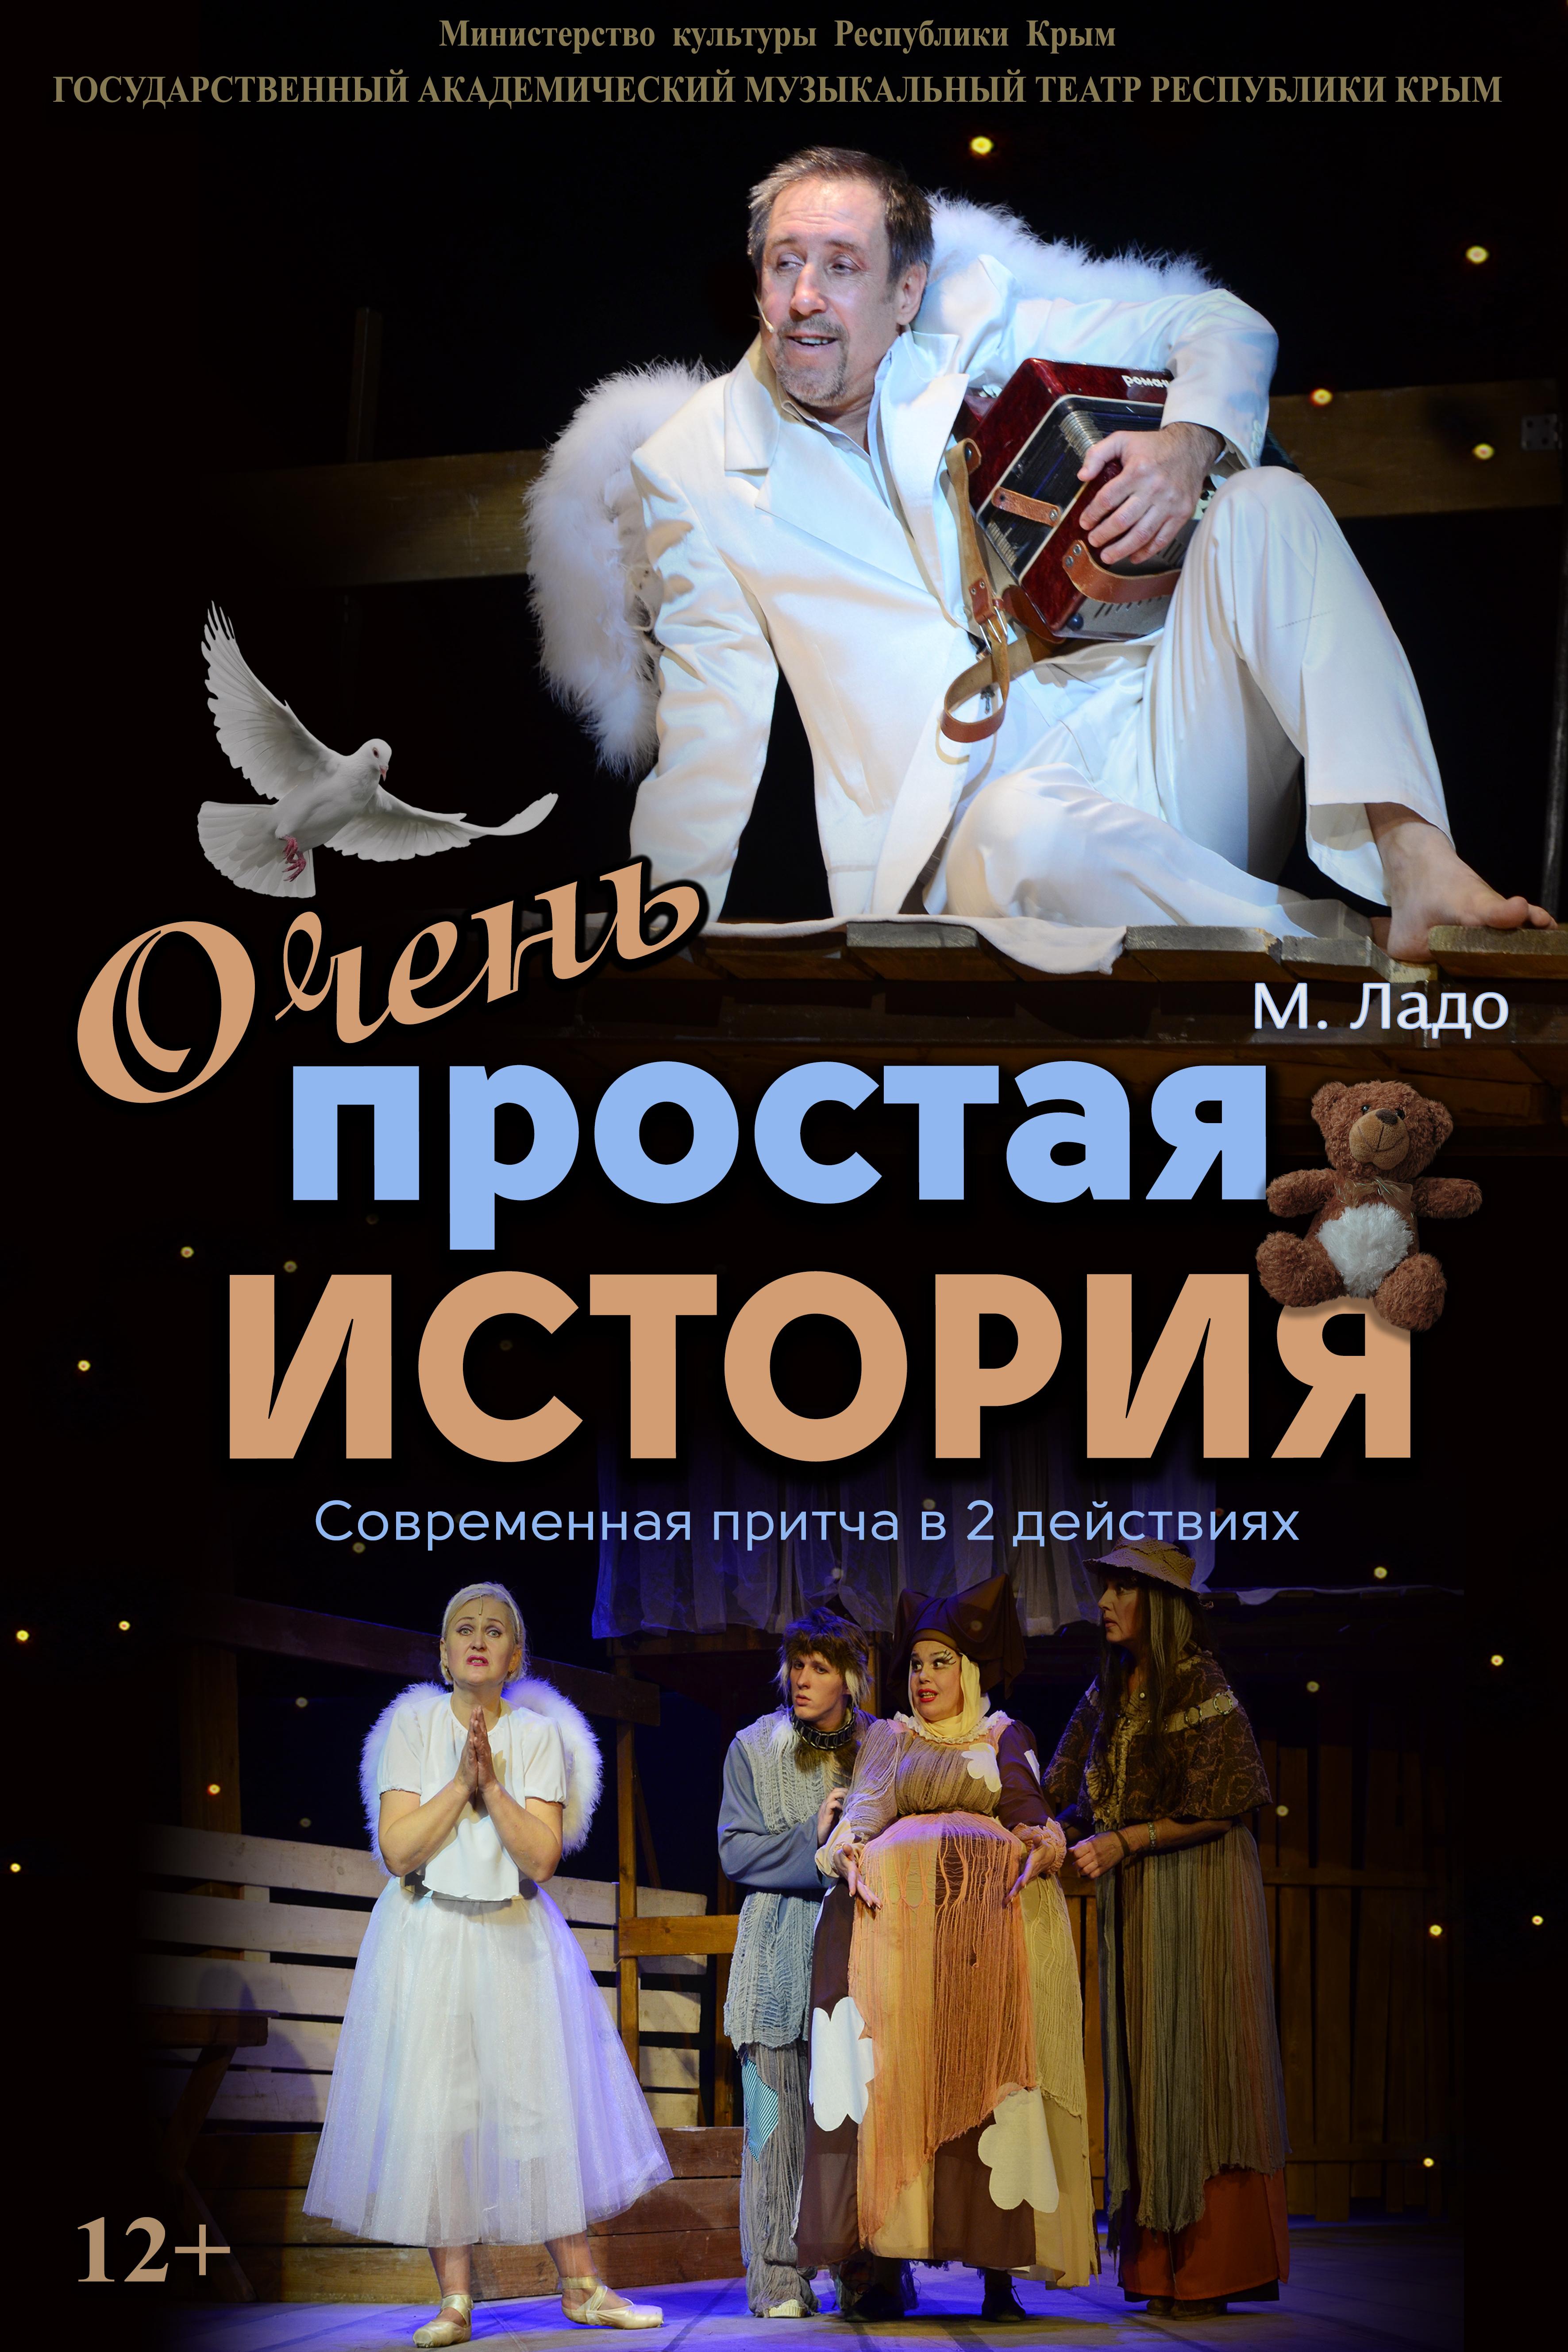 Музыкальный театр краснодар афиша январь 2017 астрахань театр кукол афиша